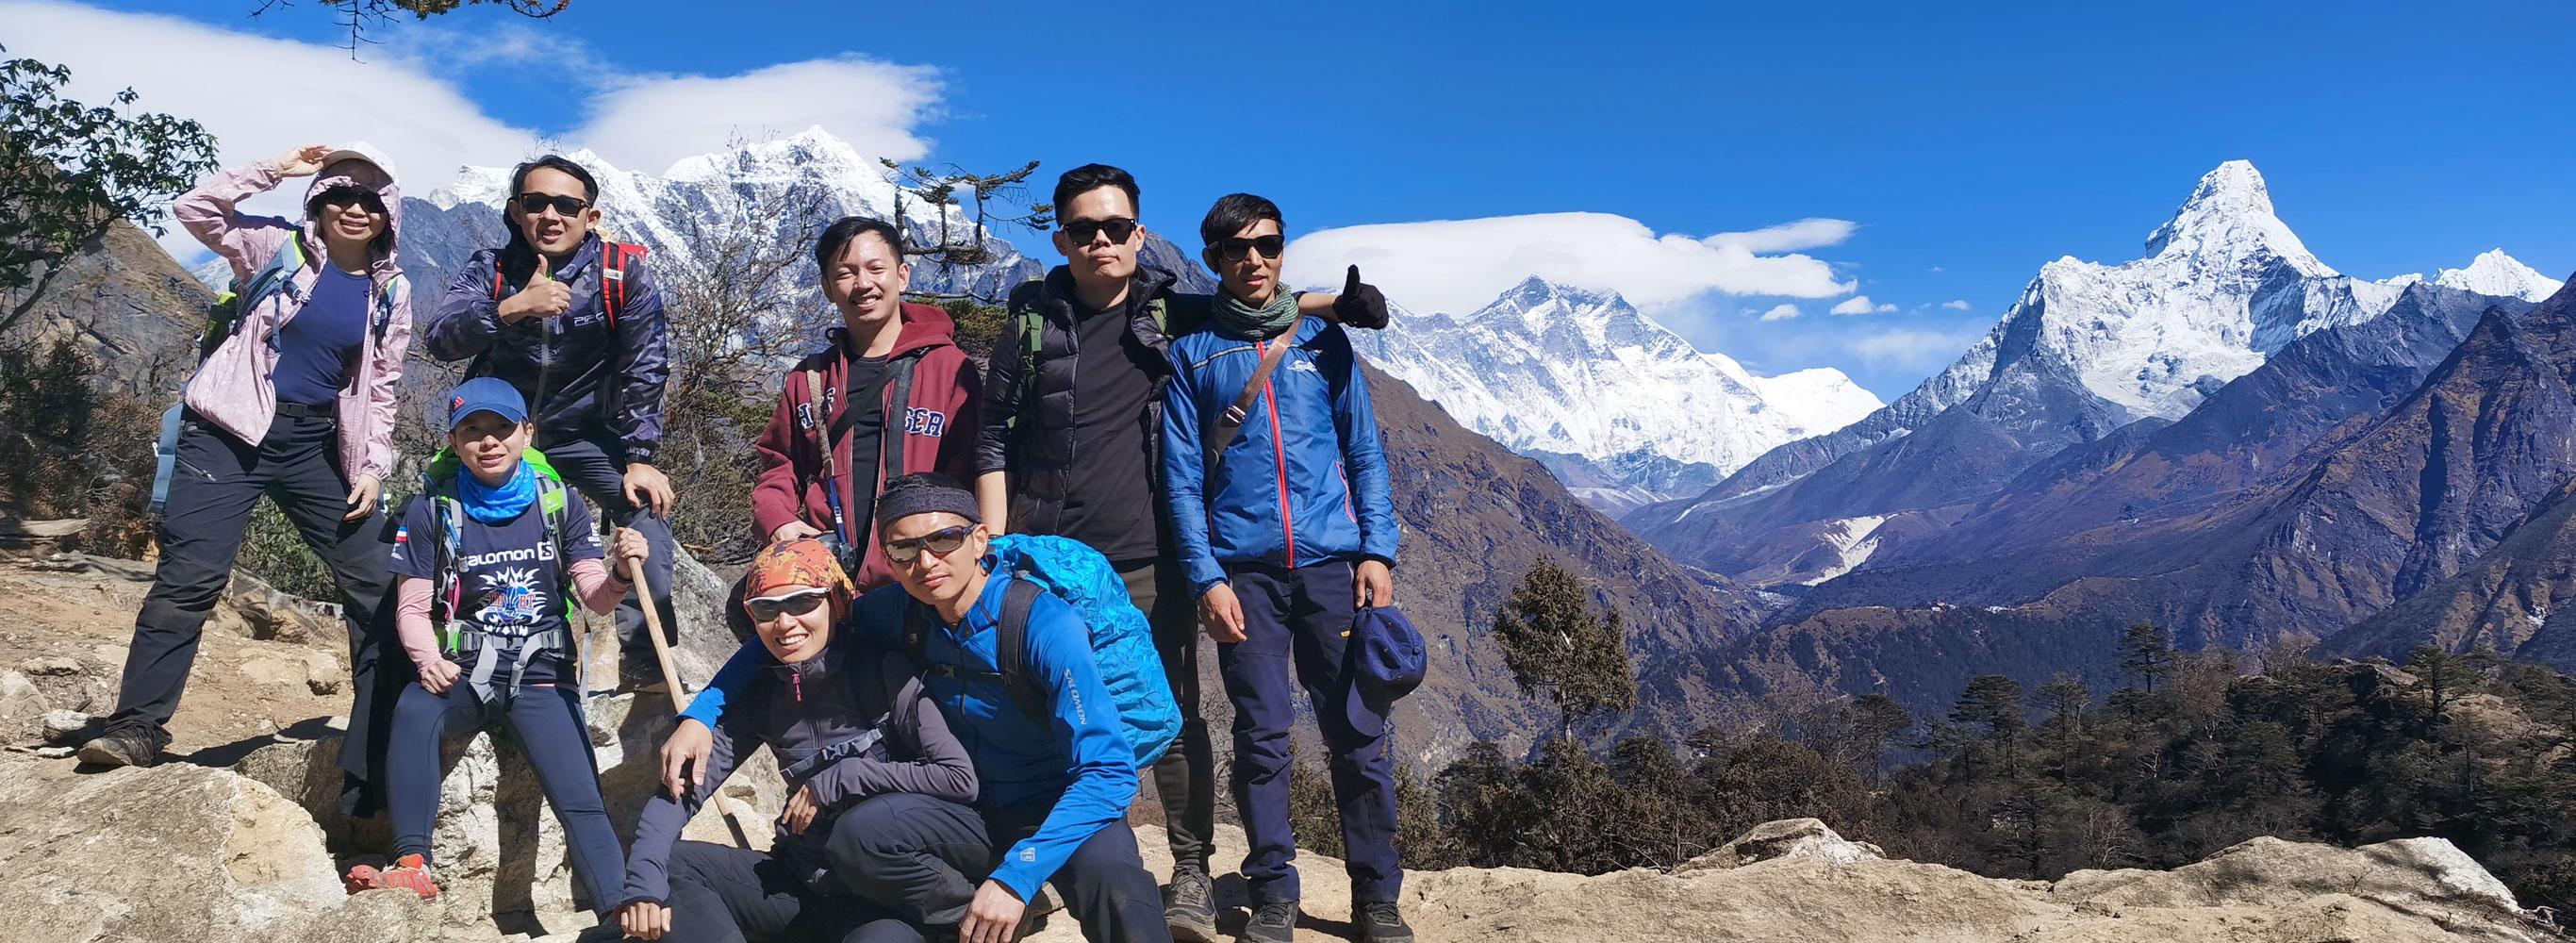 Bhandar to Everest Base Camp Trekking - 16 Days